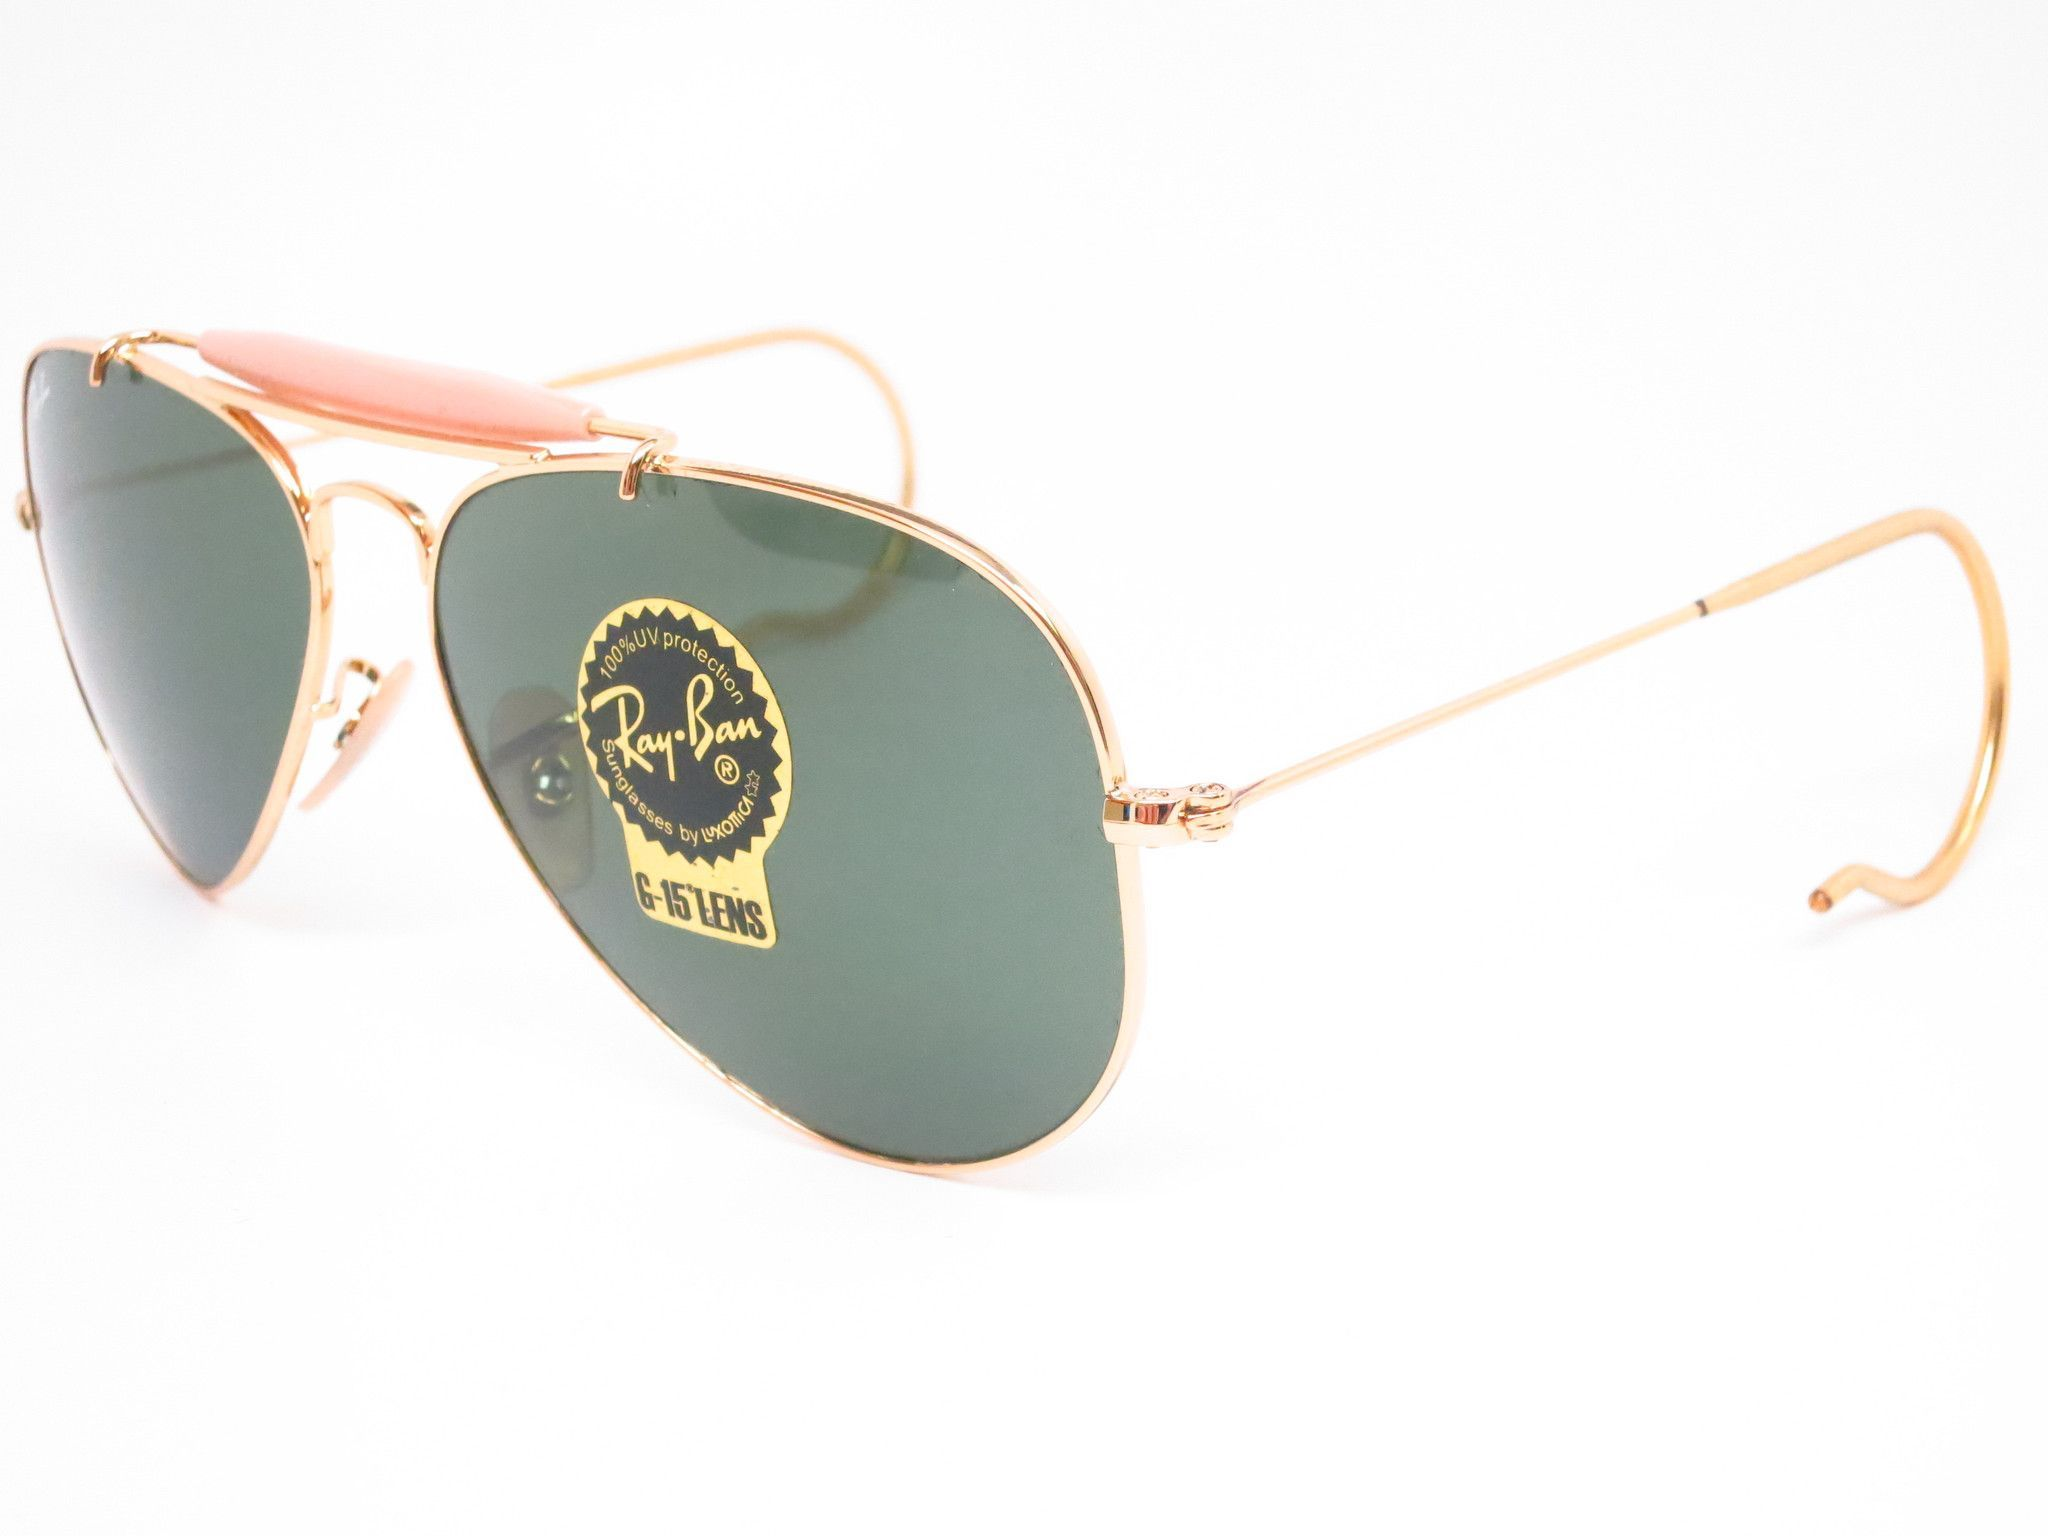 34c7a5f2fd Kourtney Kardashian Seen Wearing the RB 3030 Outdoorsman II Sunglasses